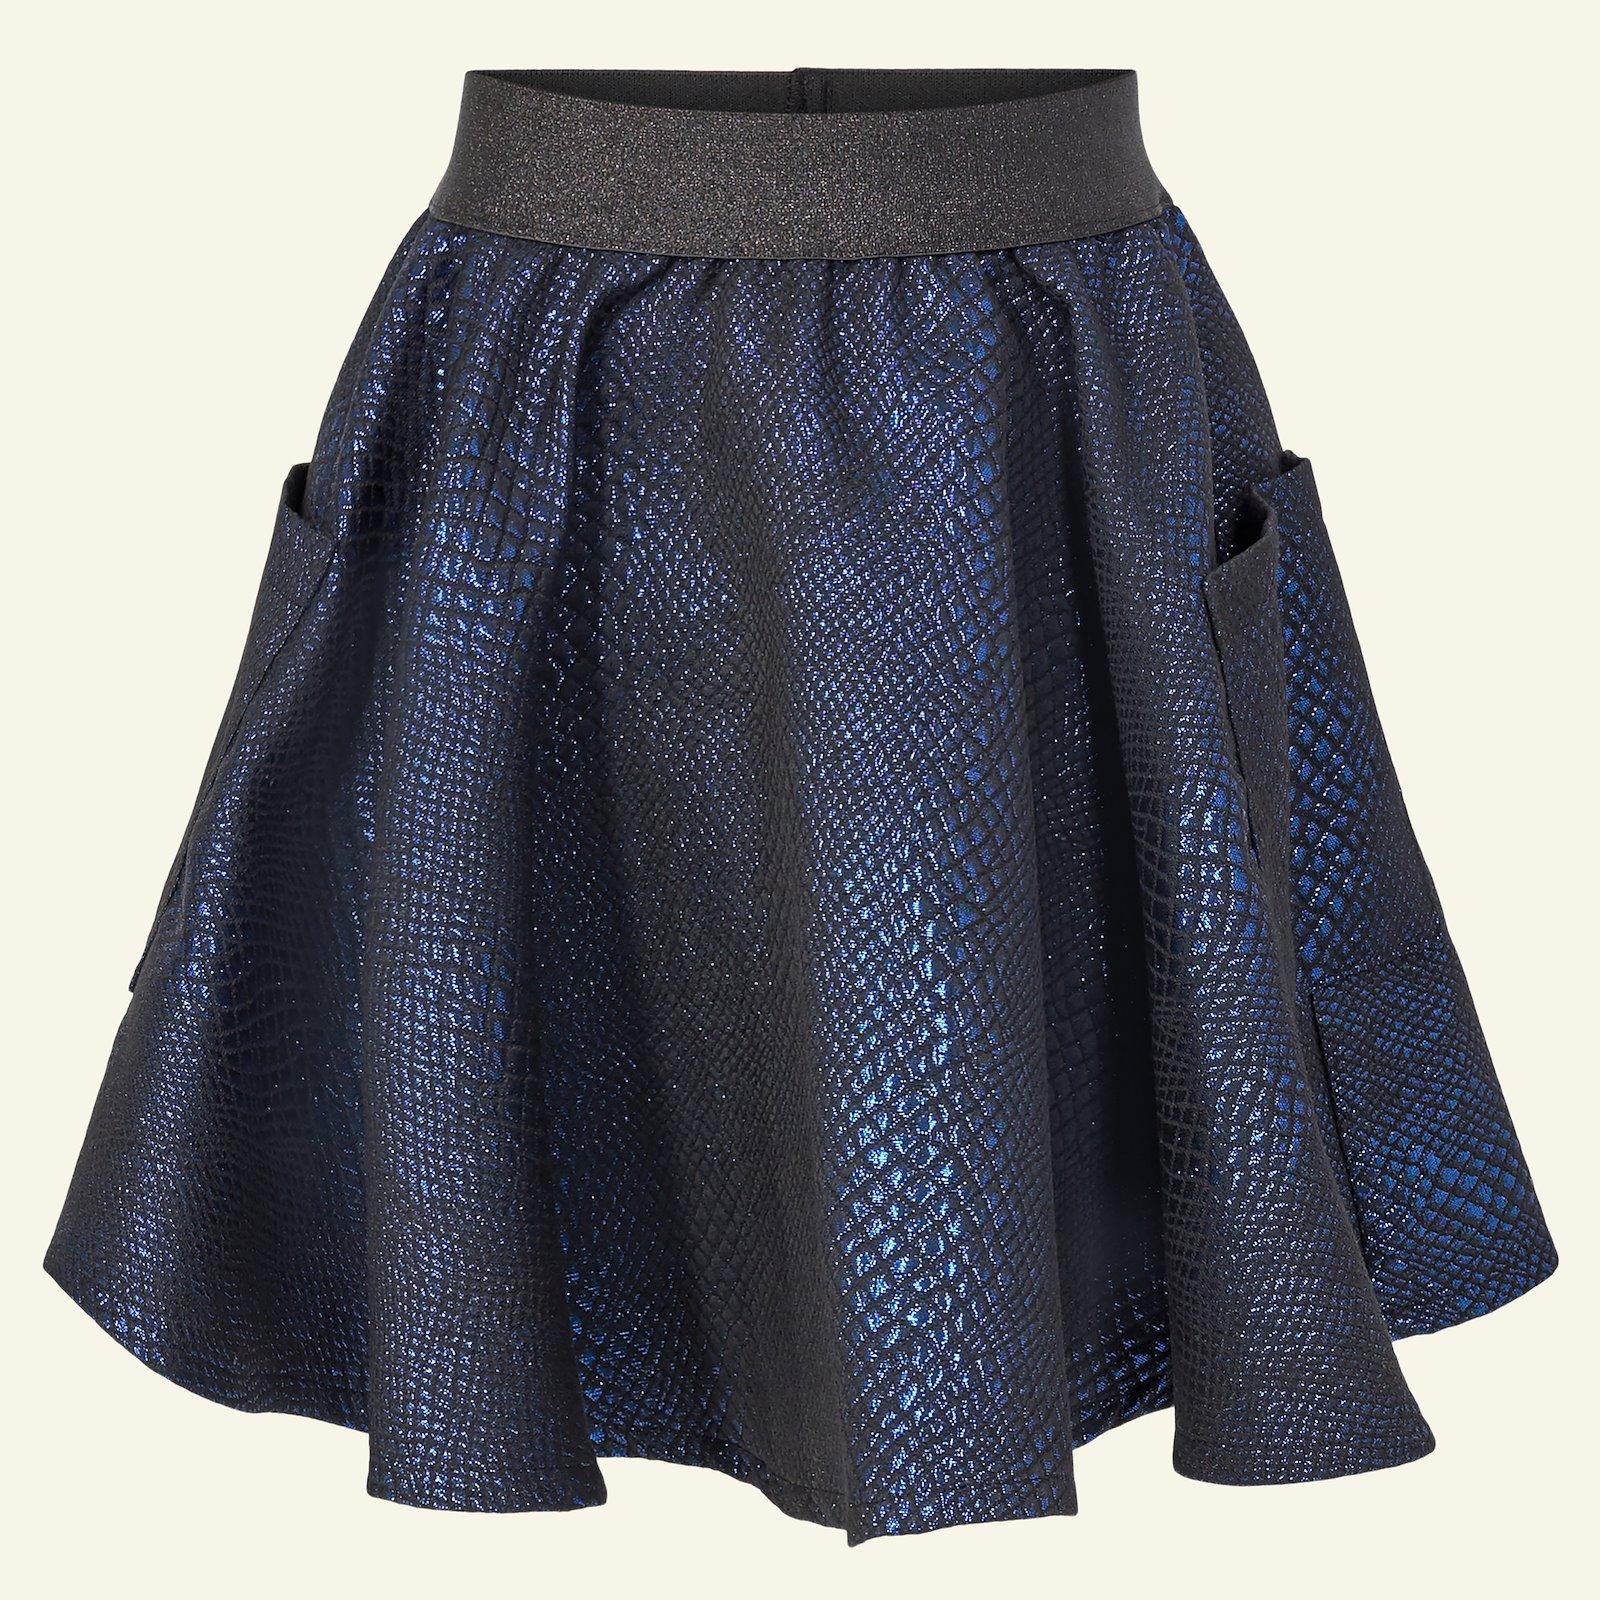 Tulle skirt, 116/6y p61018_400307_sskit